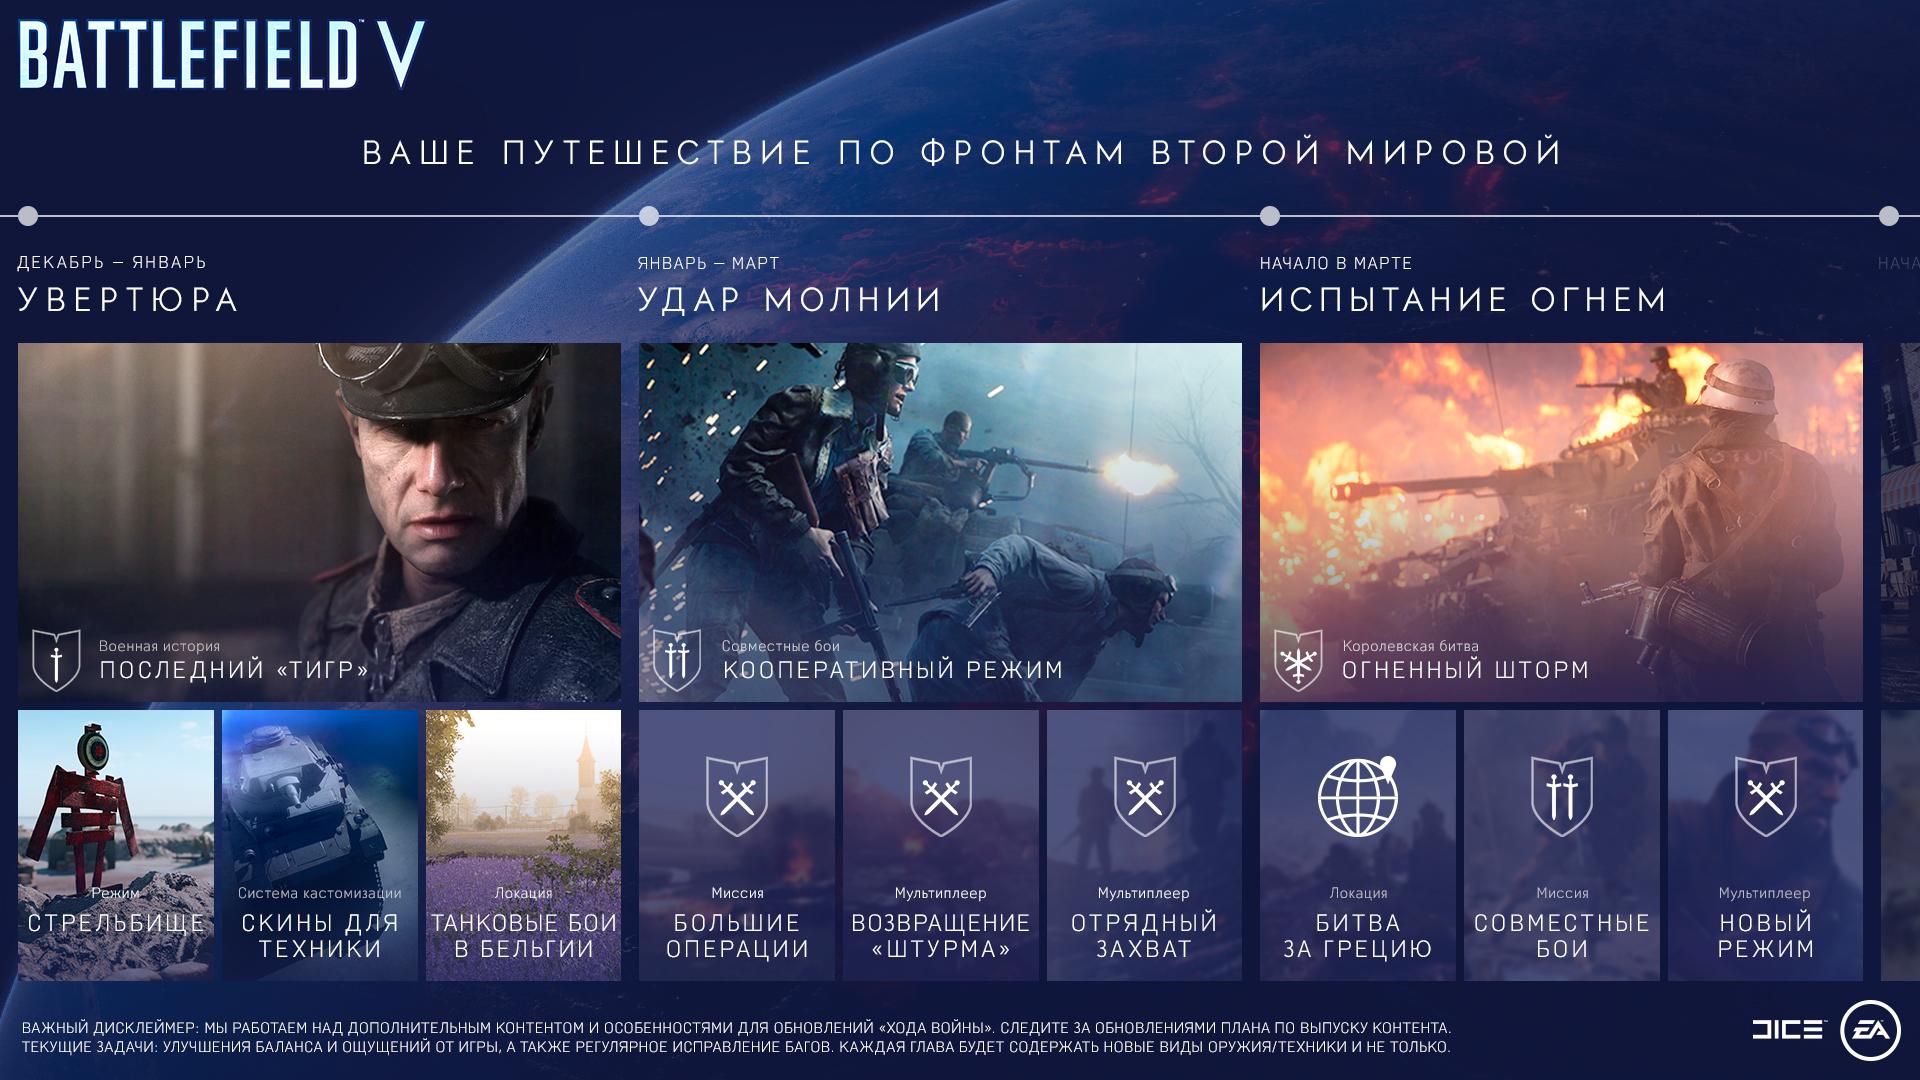 Battlefield 5 - График выхода дополнений